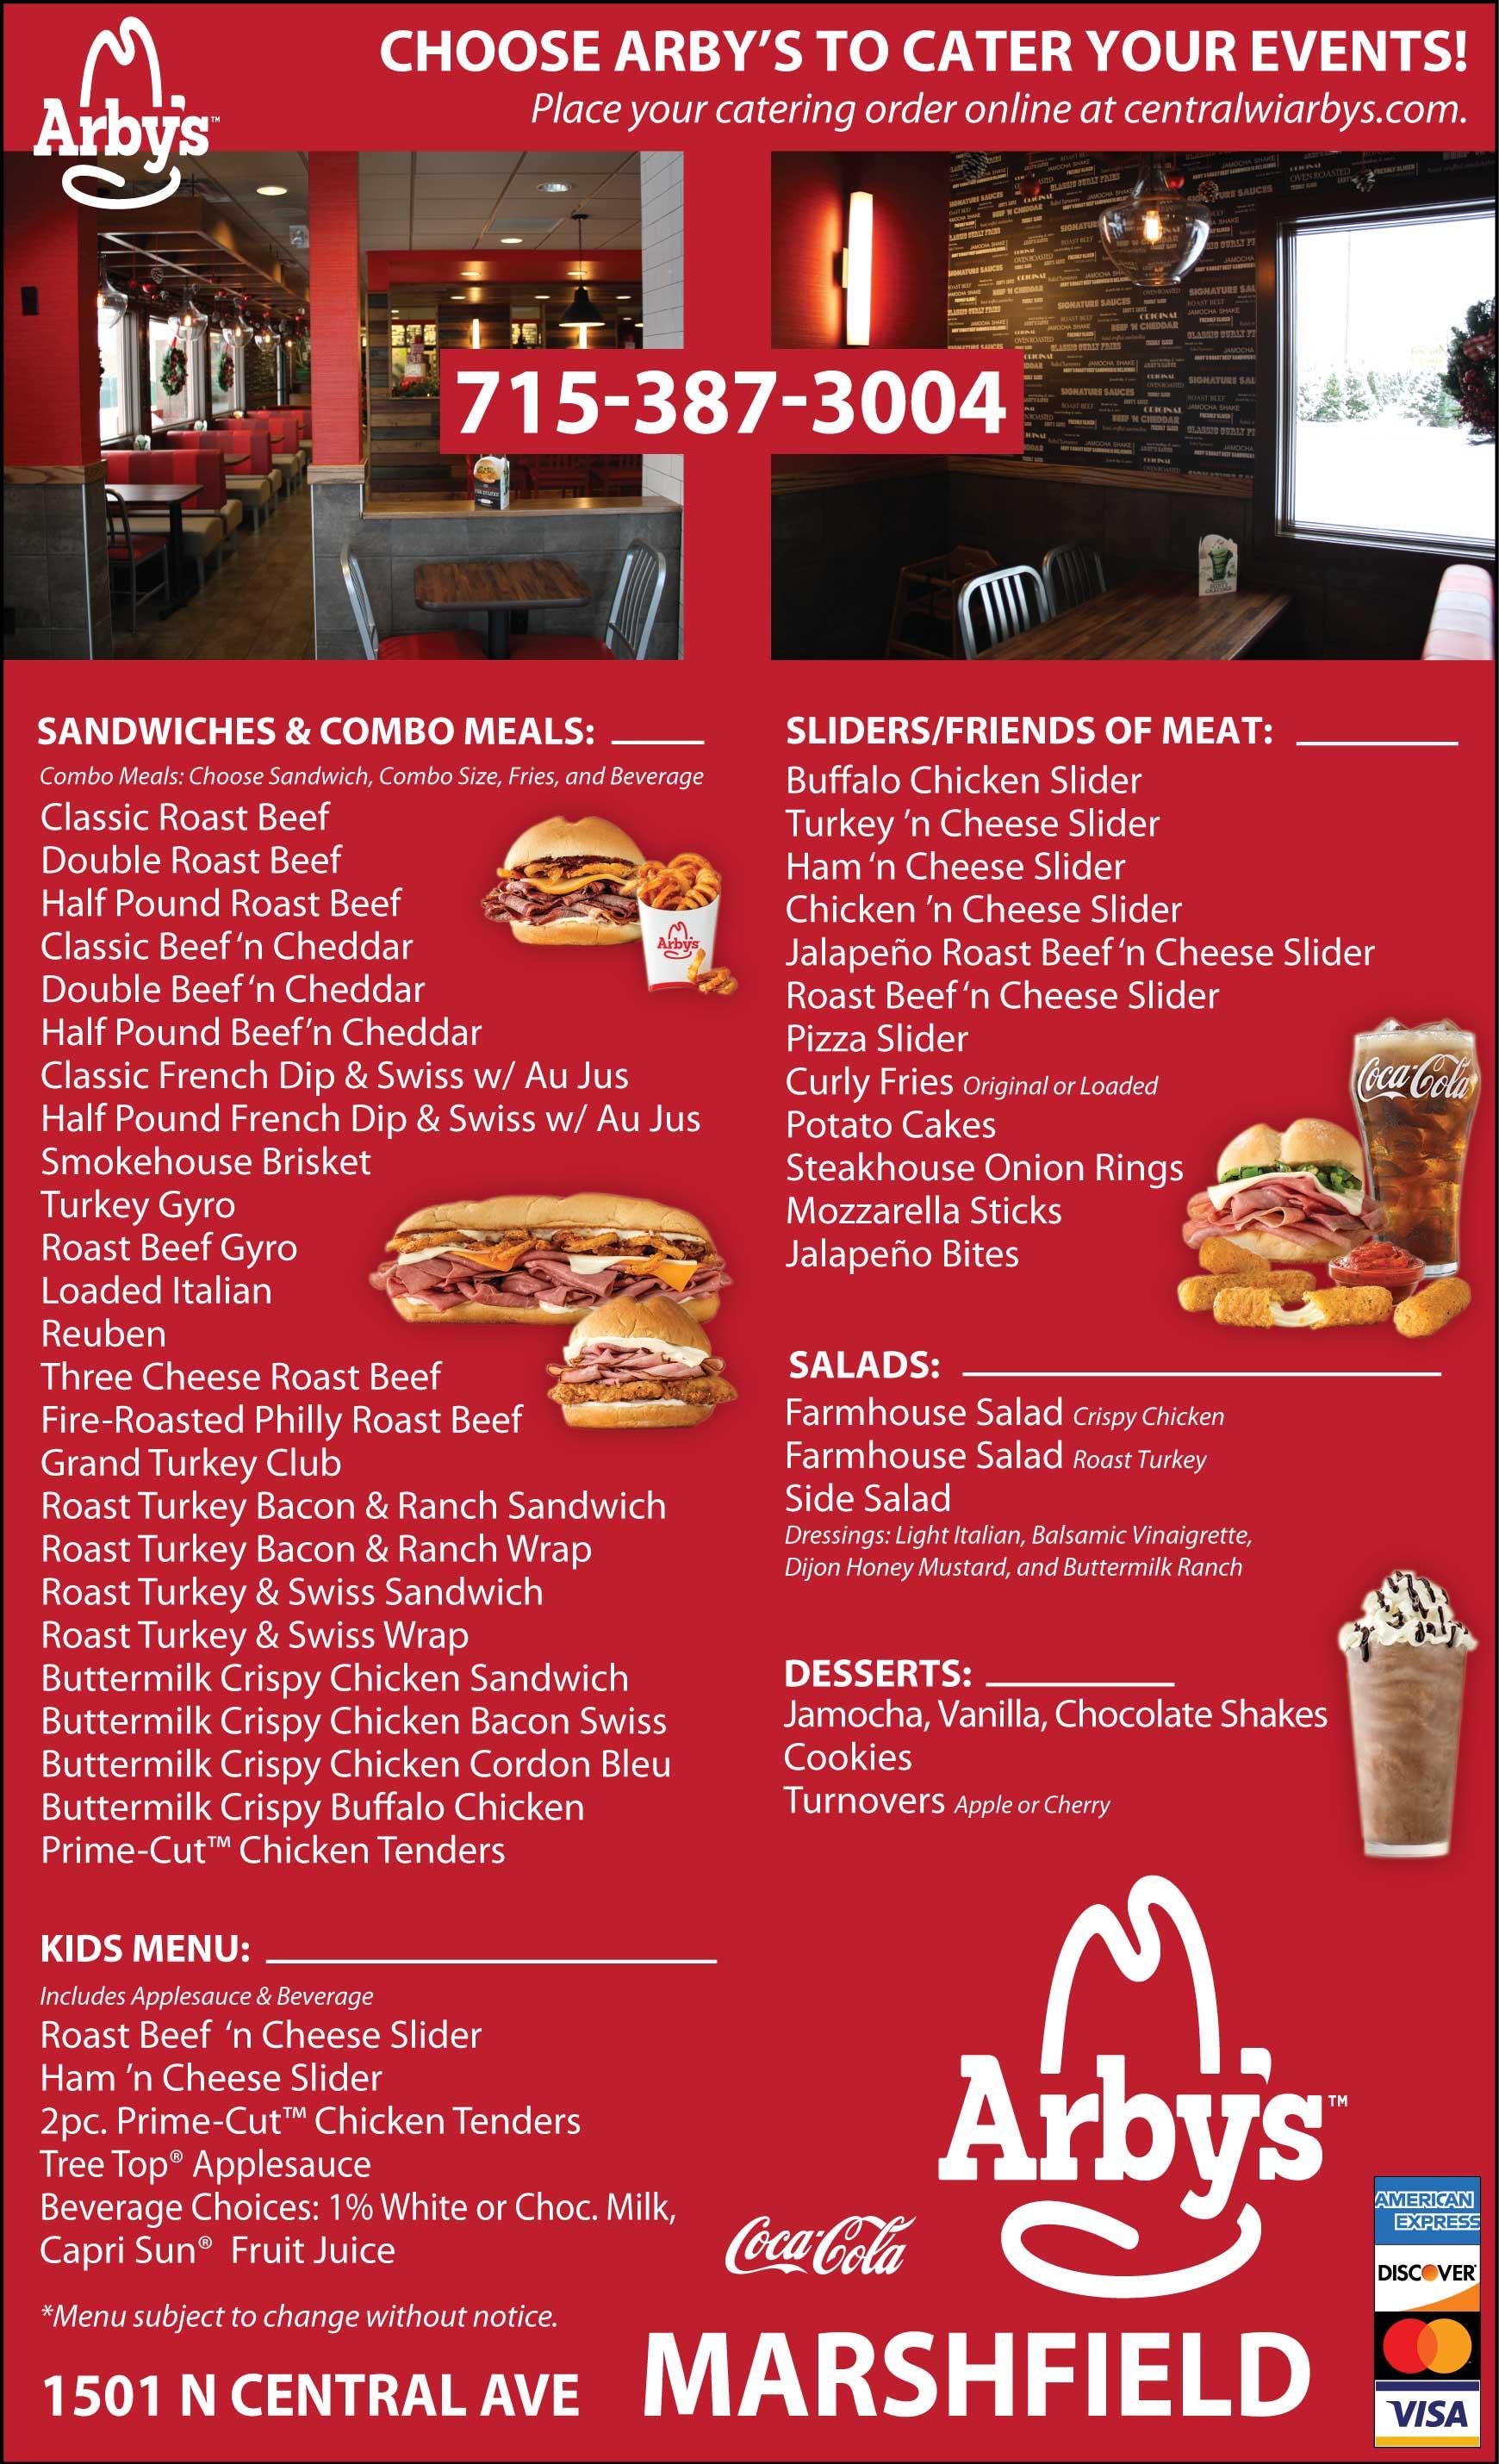 Arby's Restaurant Menu Marshfield WI